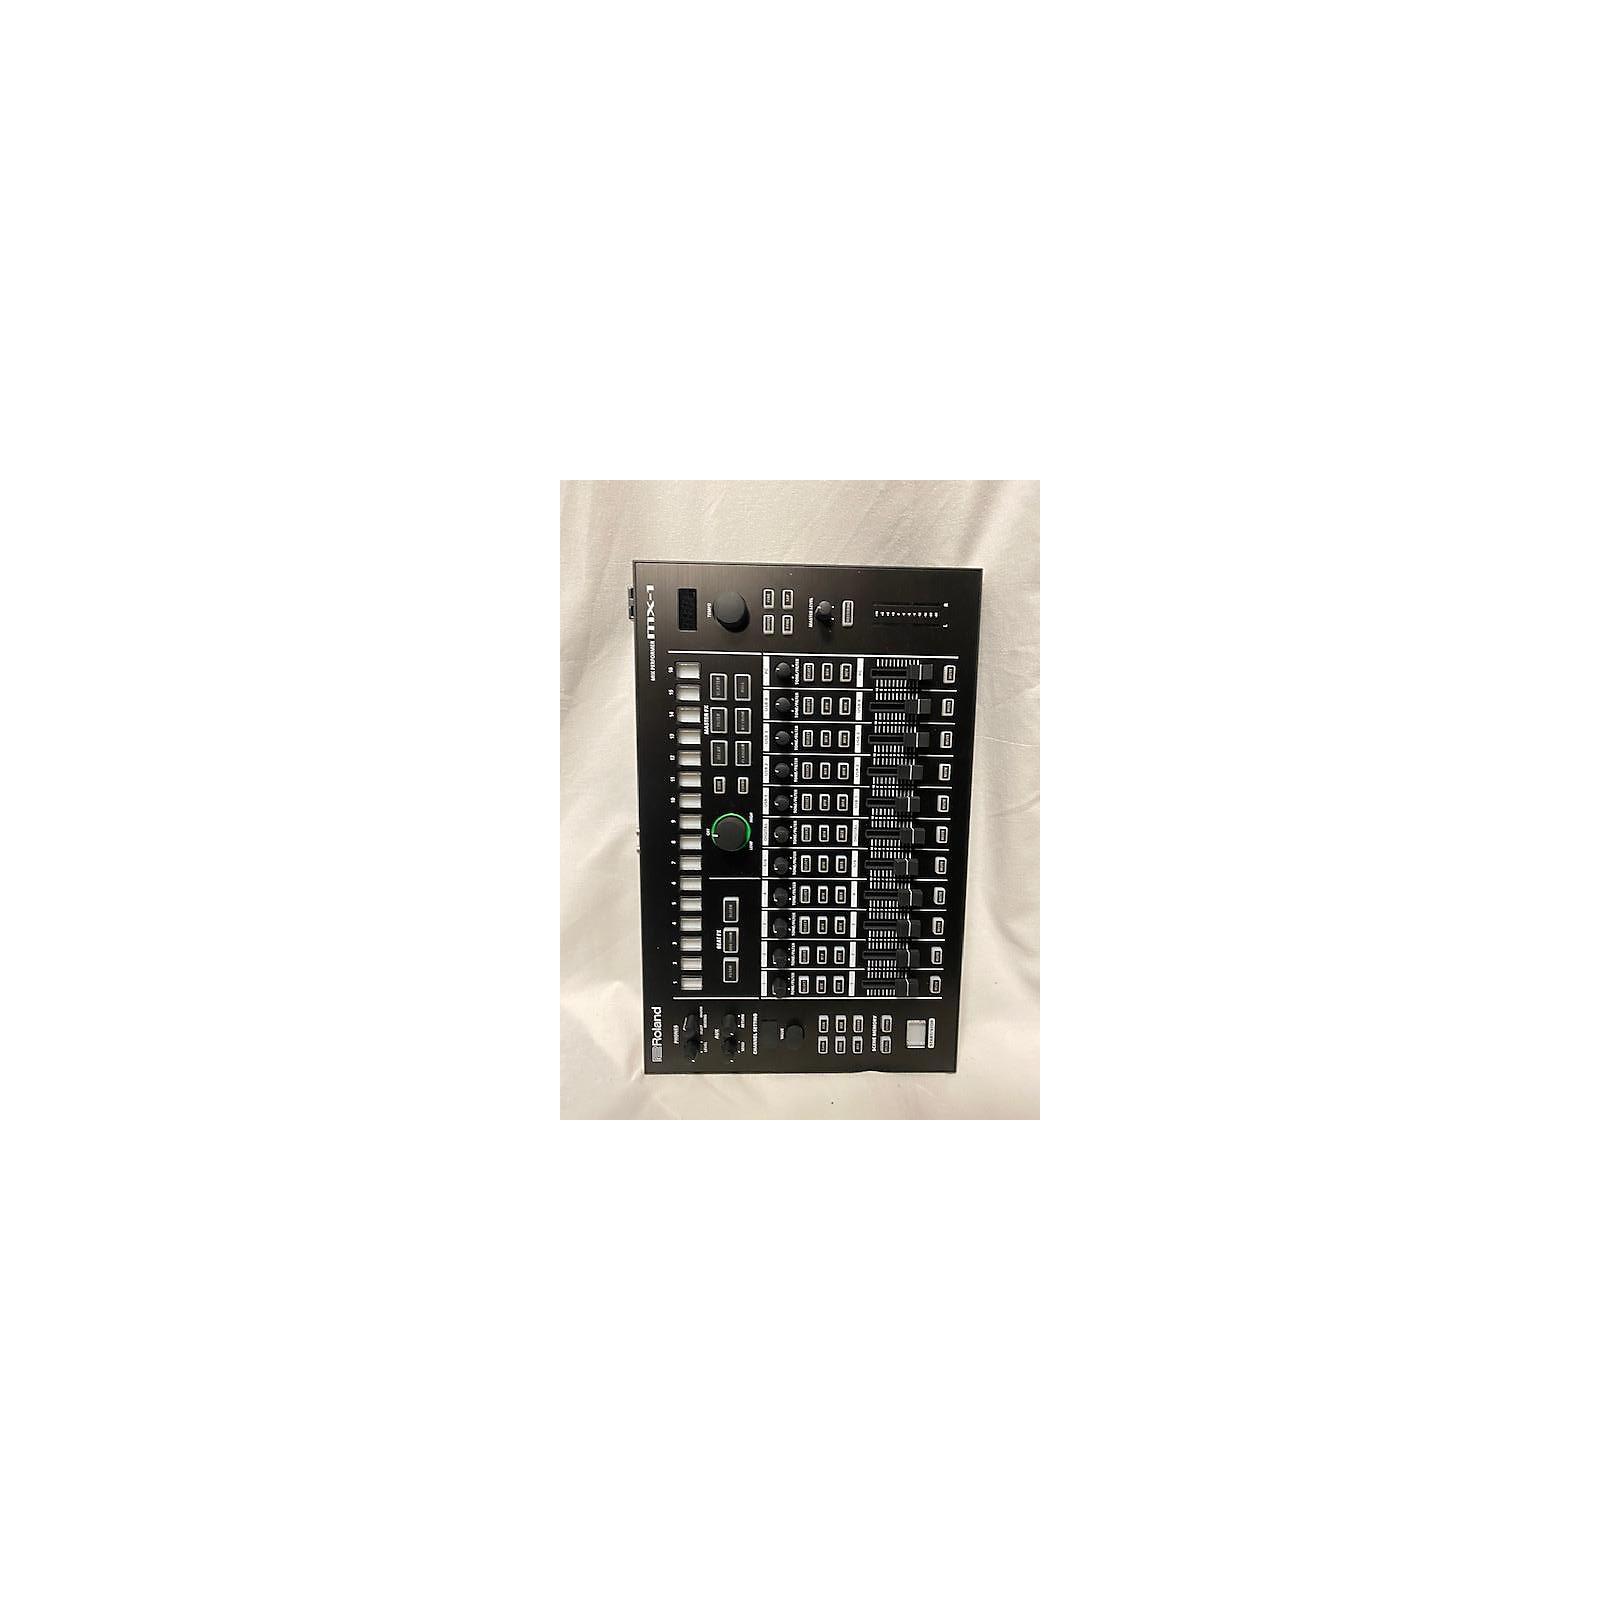 Roland MX-1 MIDI Utility